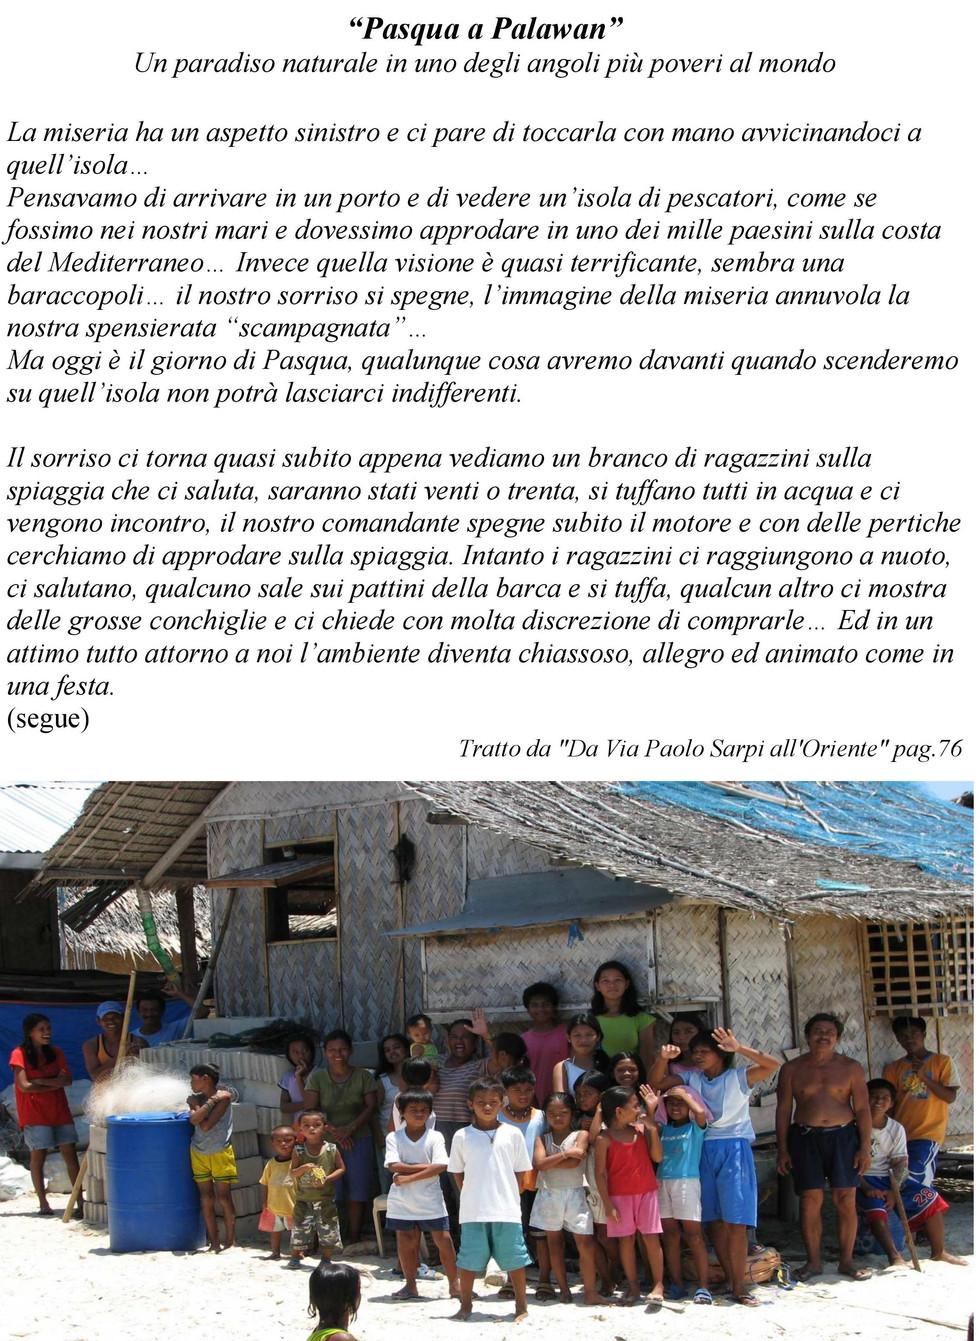 6 Poster Pasqua a Palawan.jpg